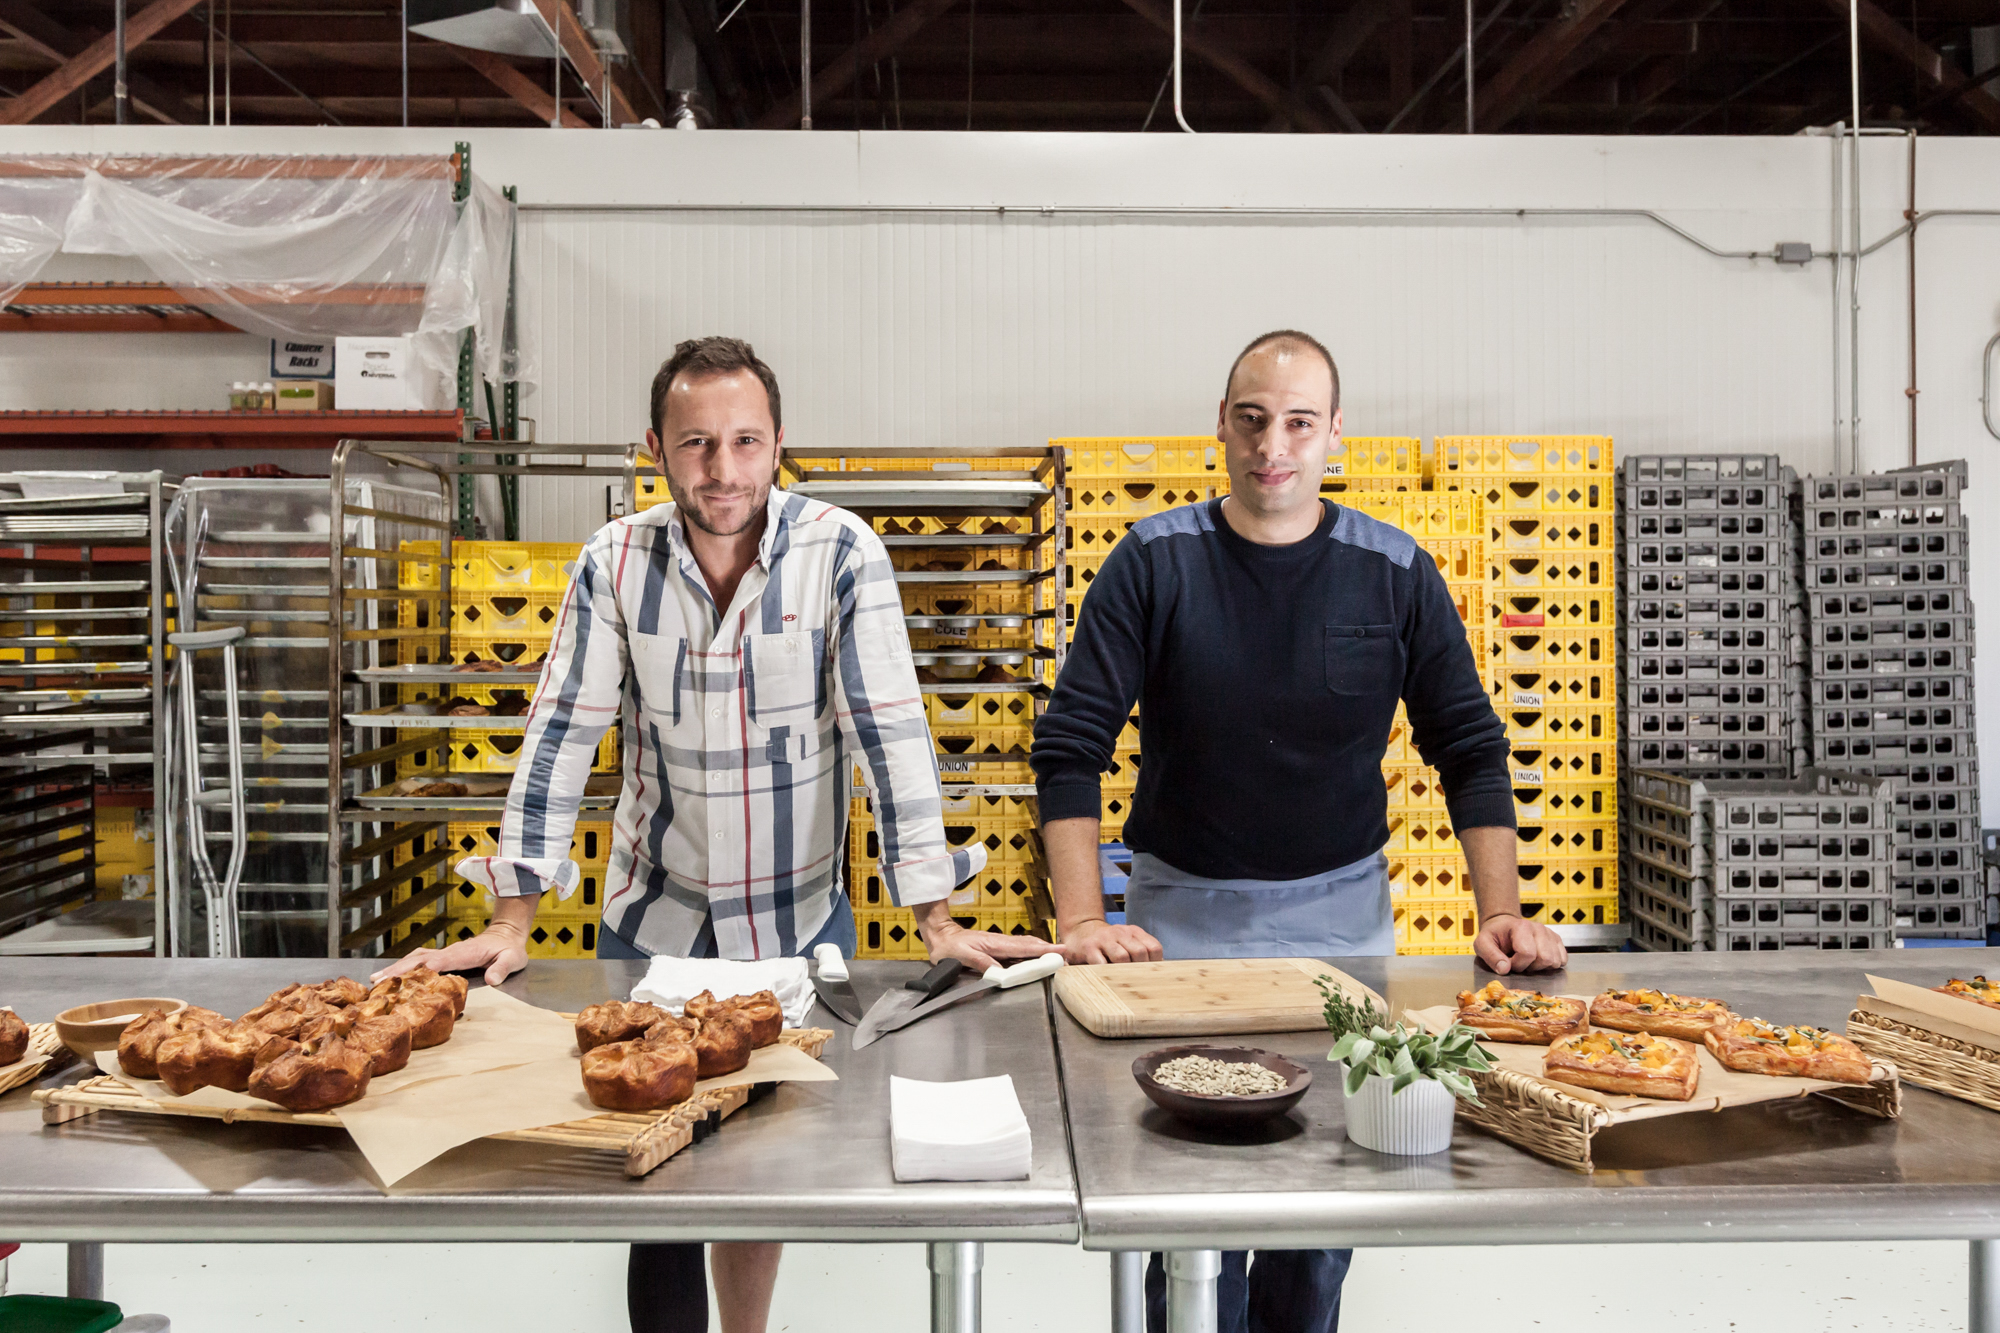 Co-owner Nicolas Bernardi and director of food innovation Stephane Stocki, ready to take on the world